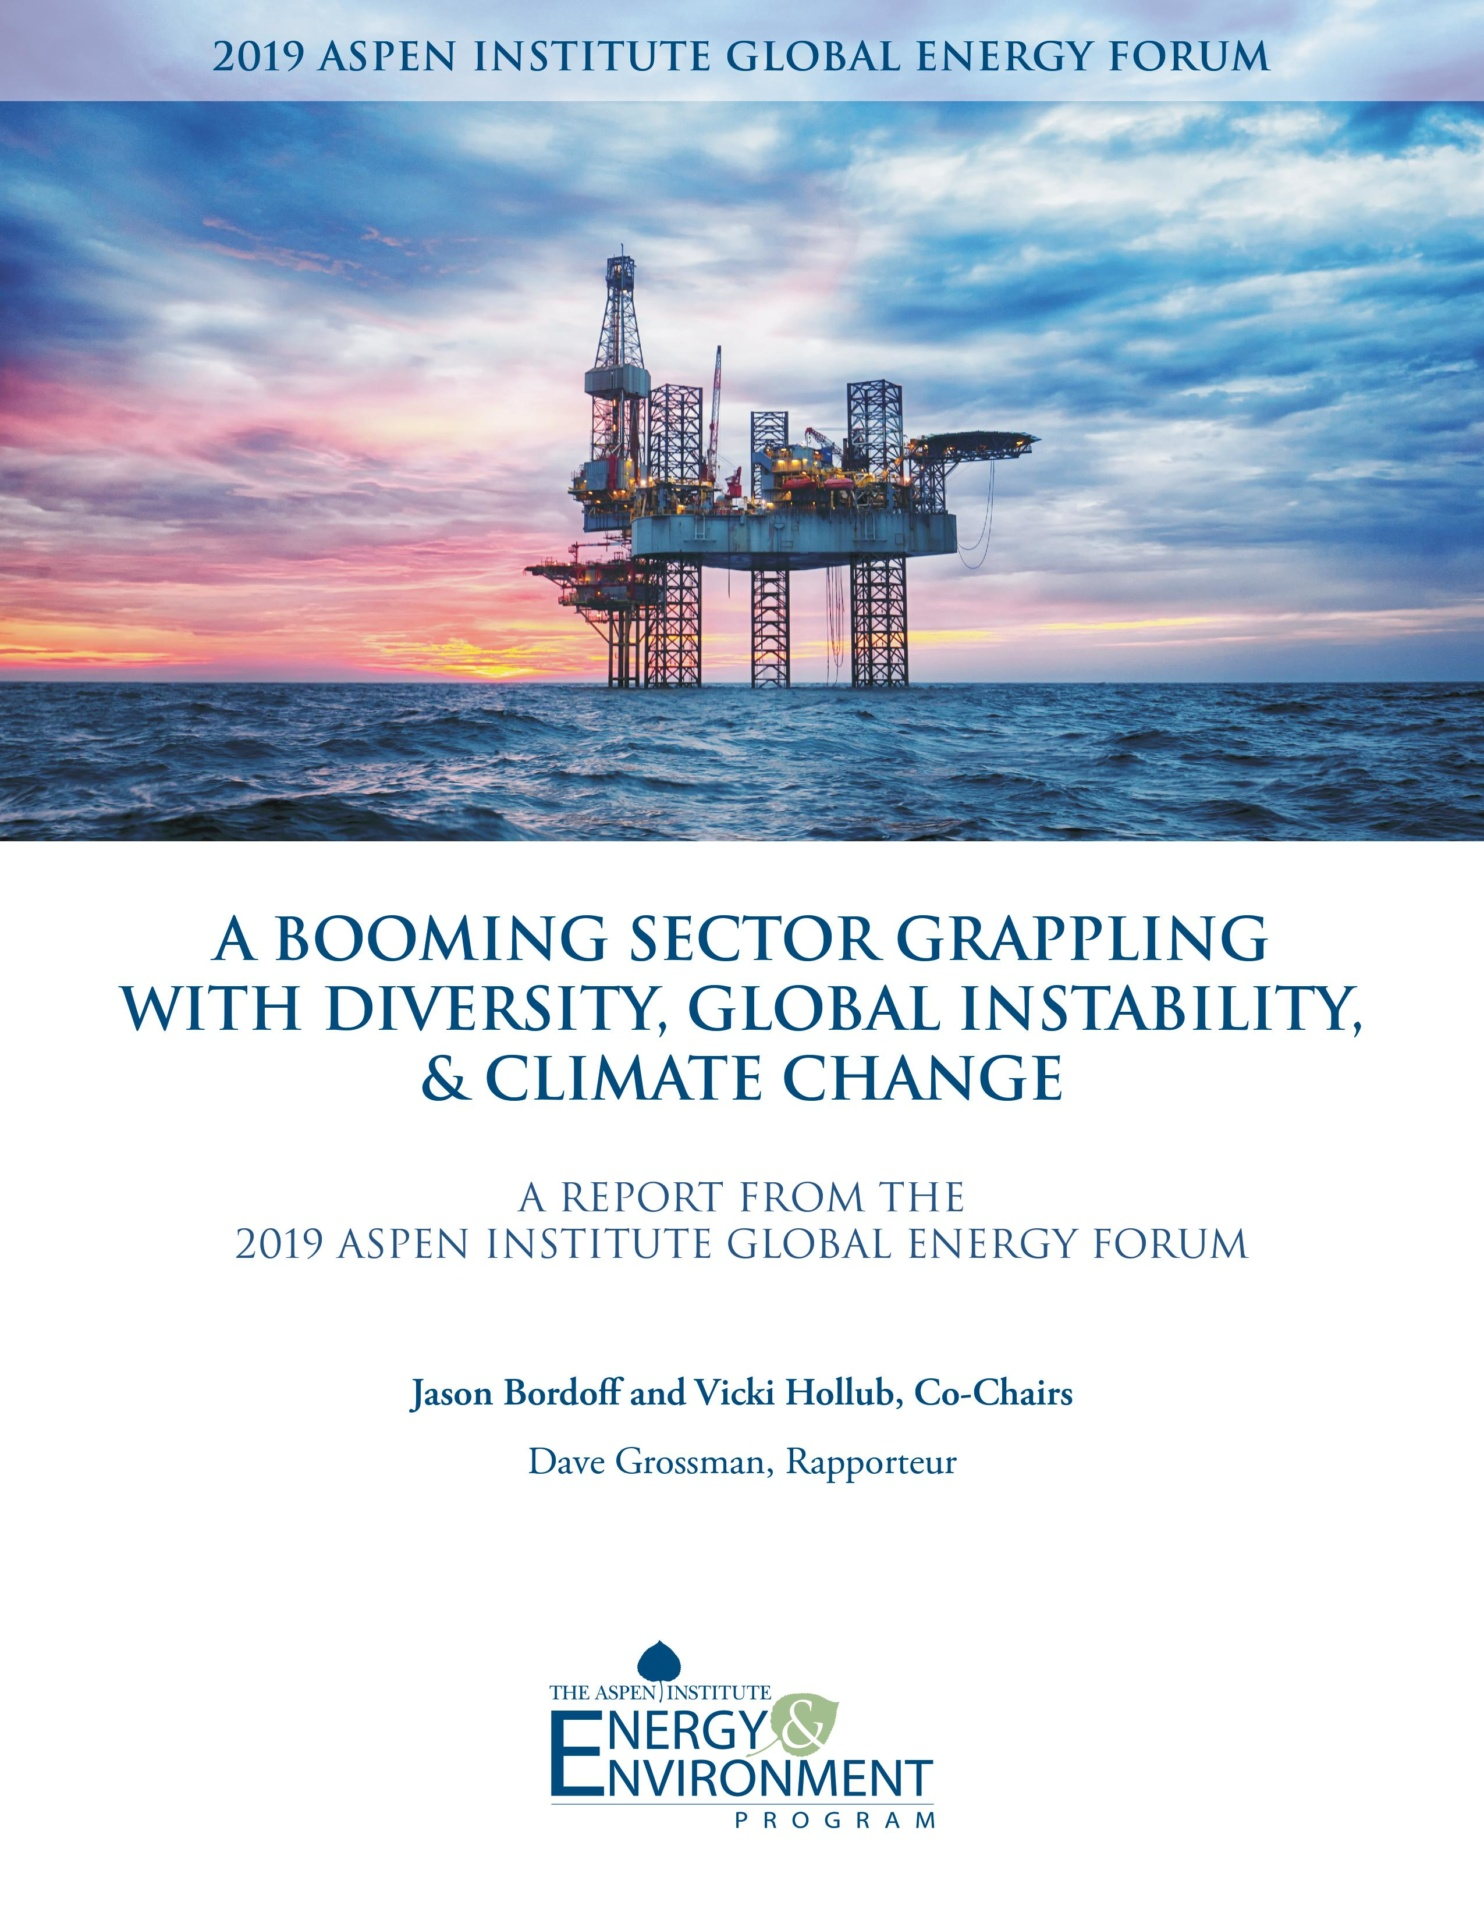 2019 Global Energy Forum Report